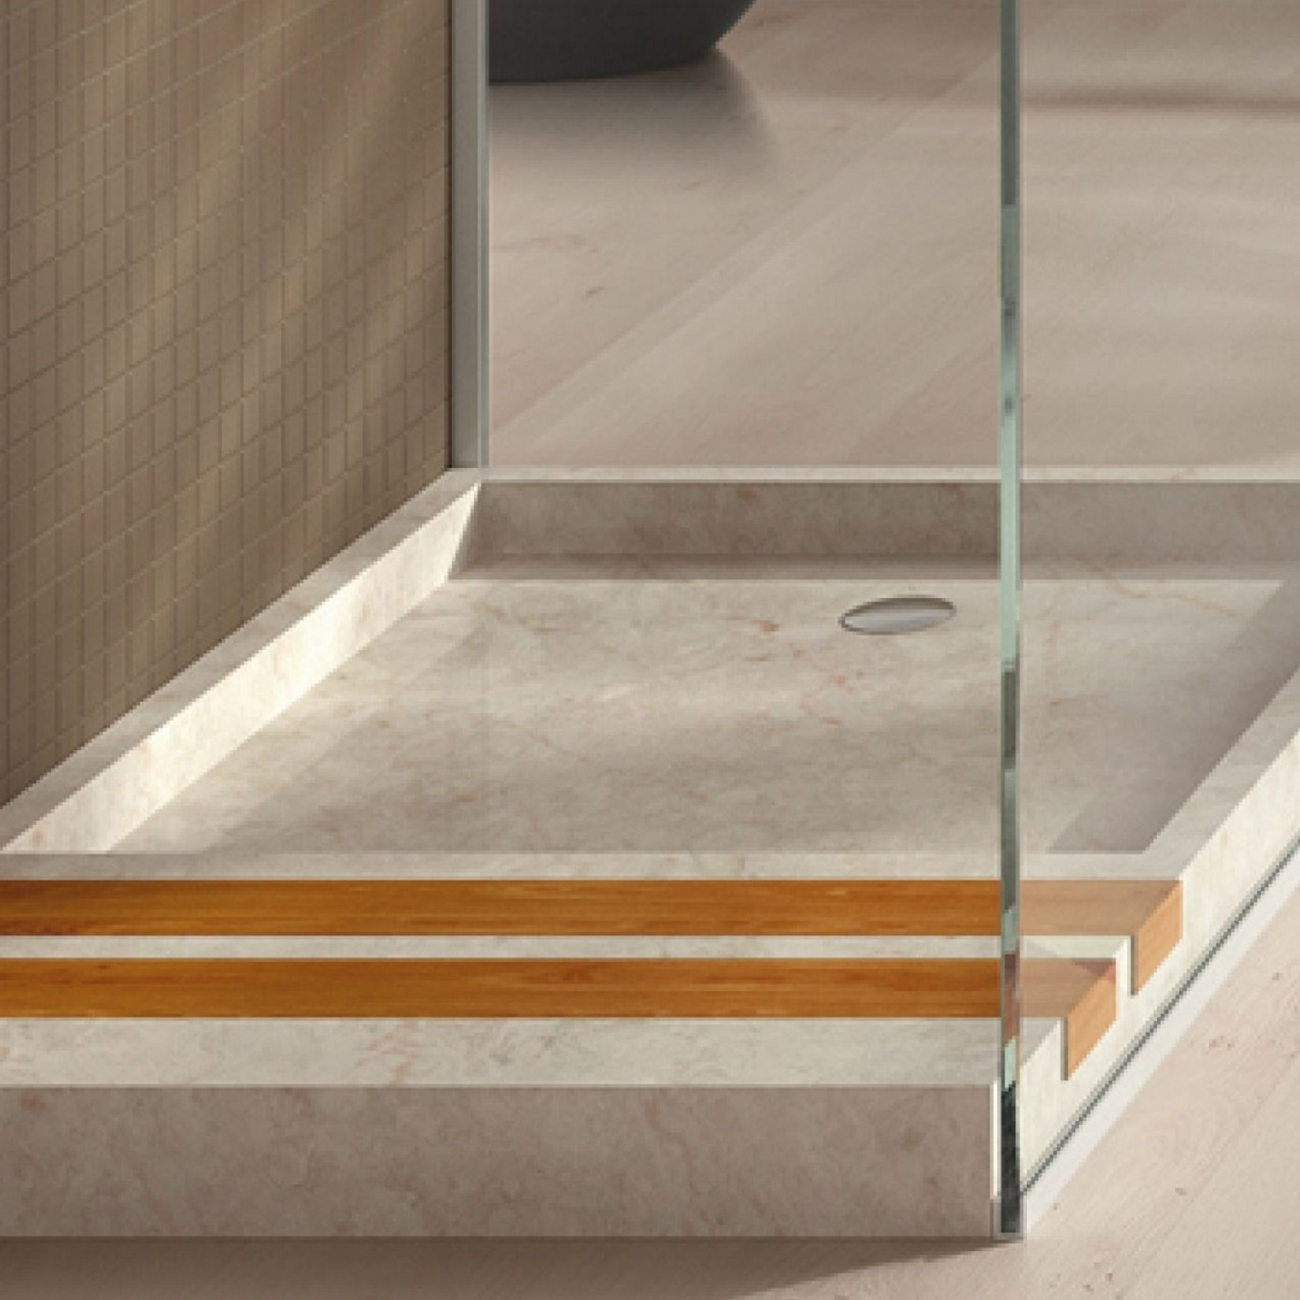 Concrete shower tray ultimate power led flashlight